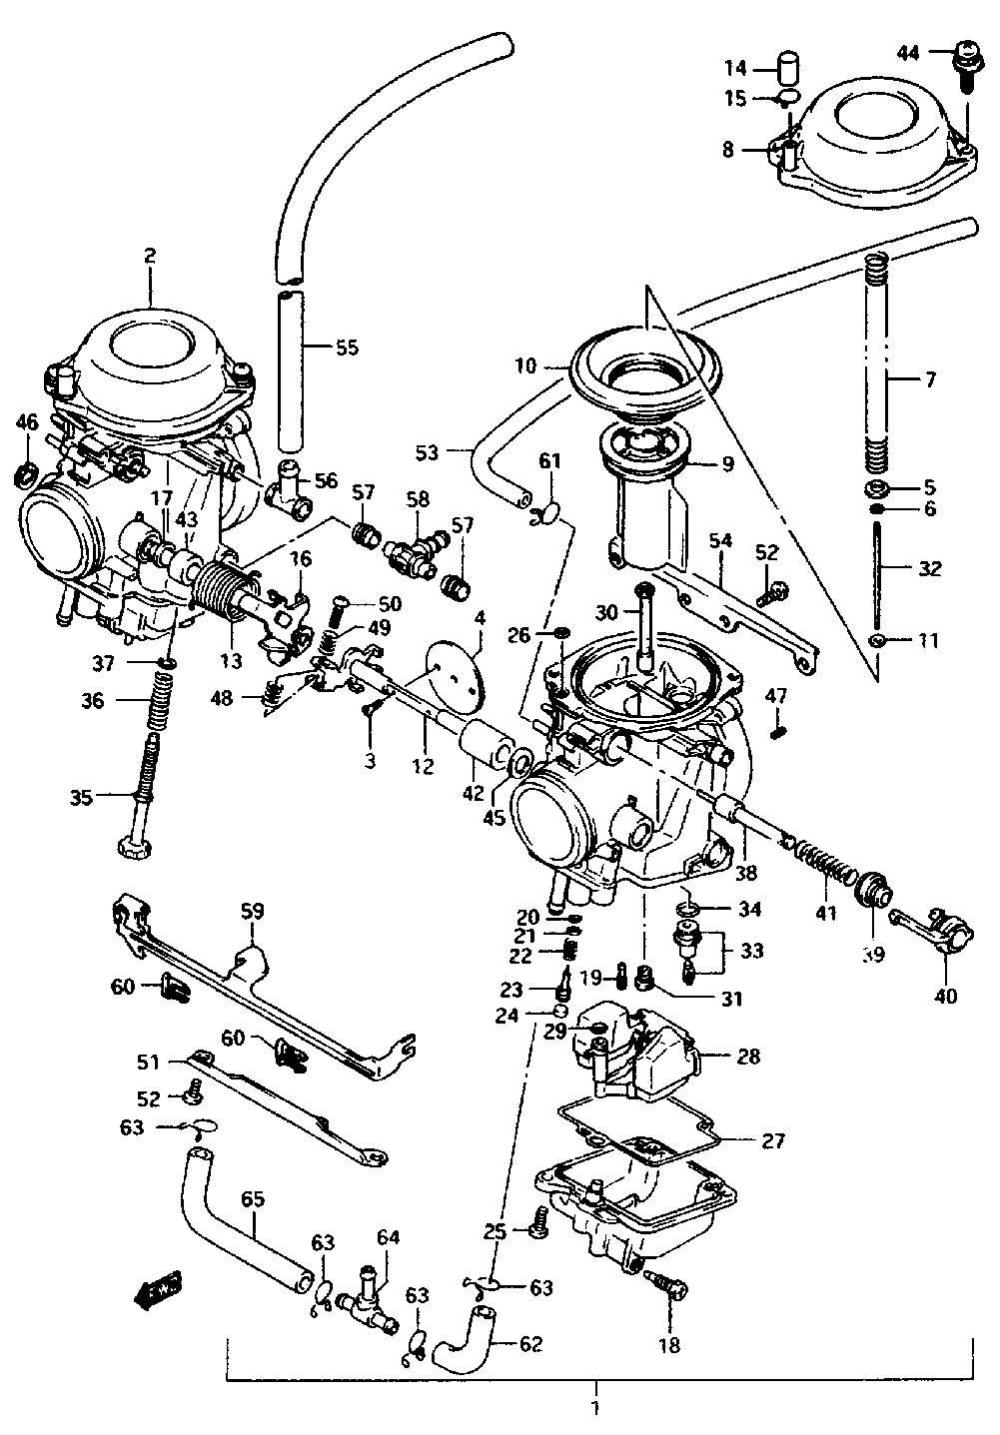 medium resolution of keihin vb carb diagram